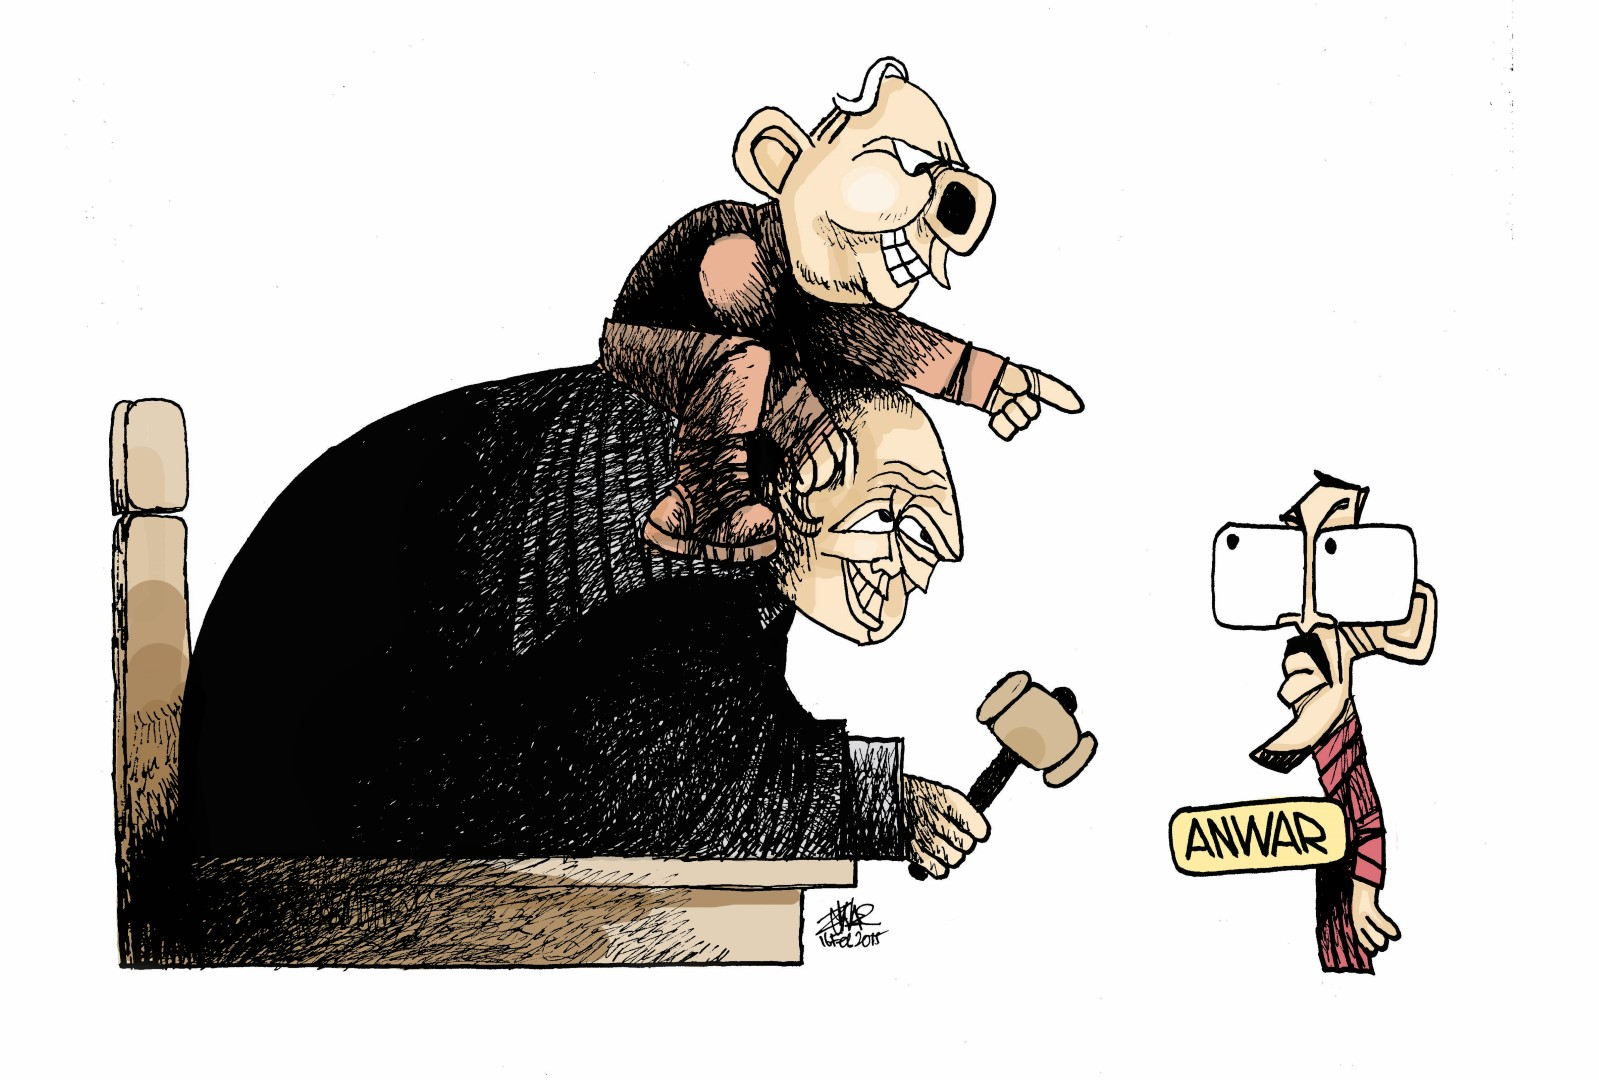 cartoonkini-court-anwar-16-feb-2015